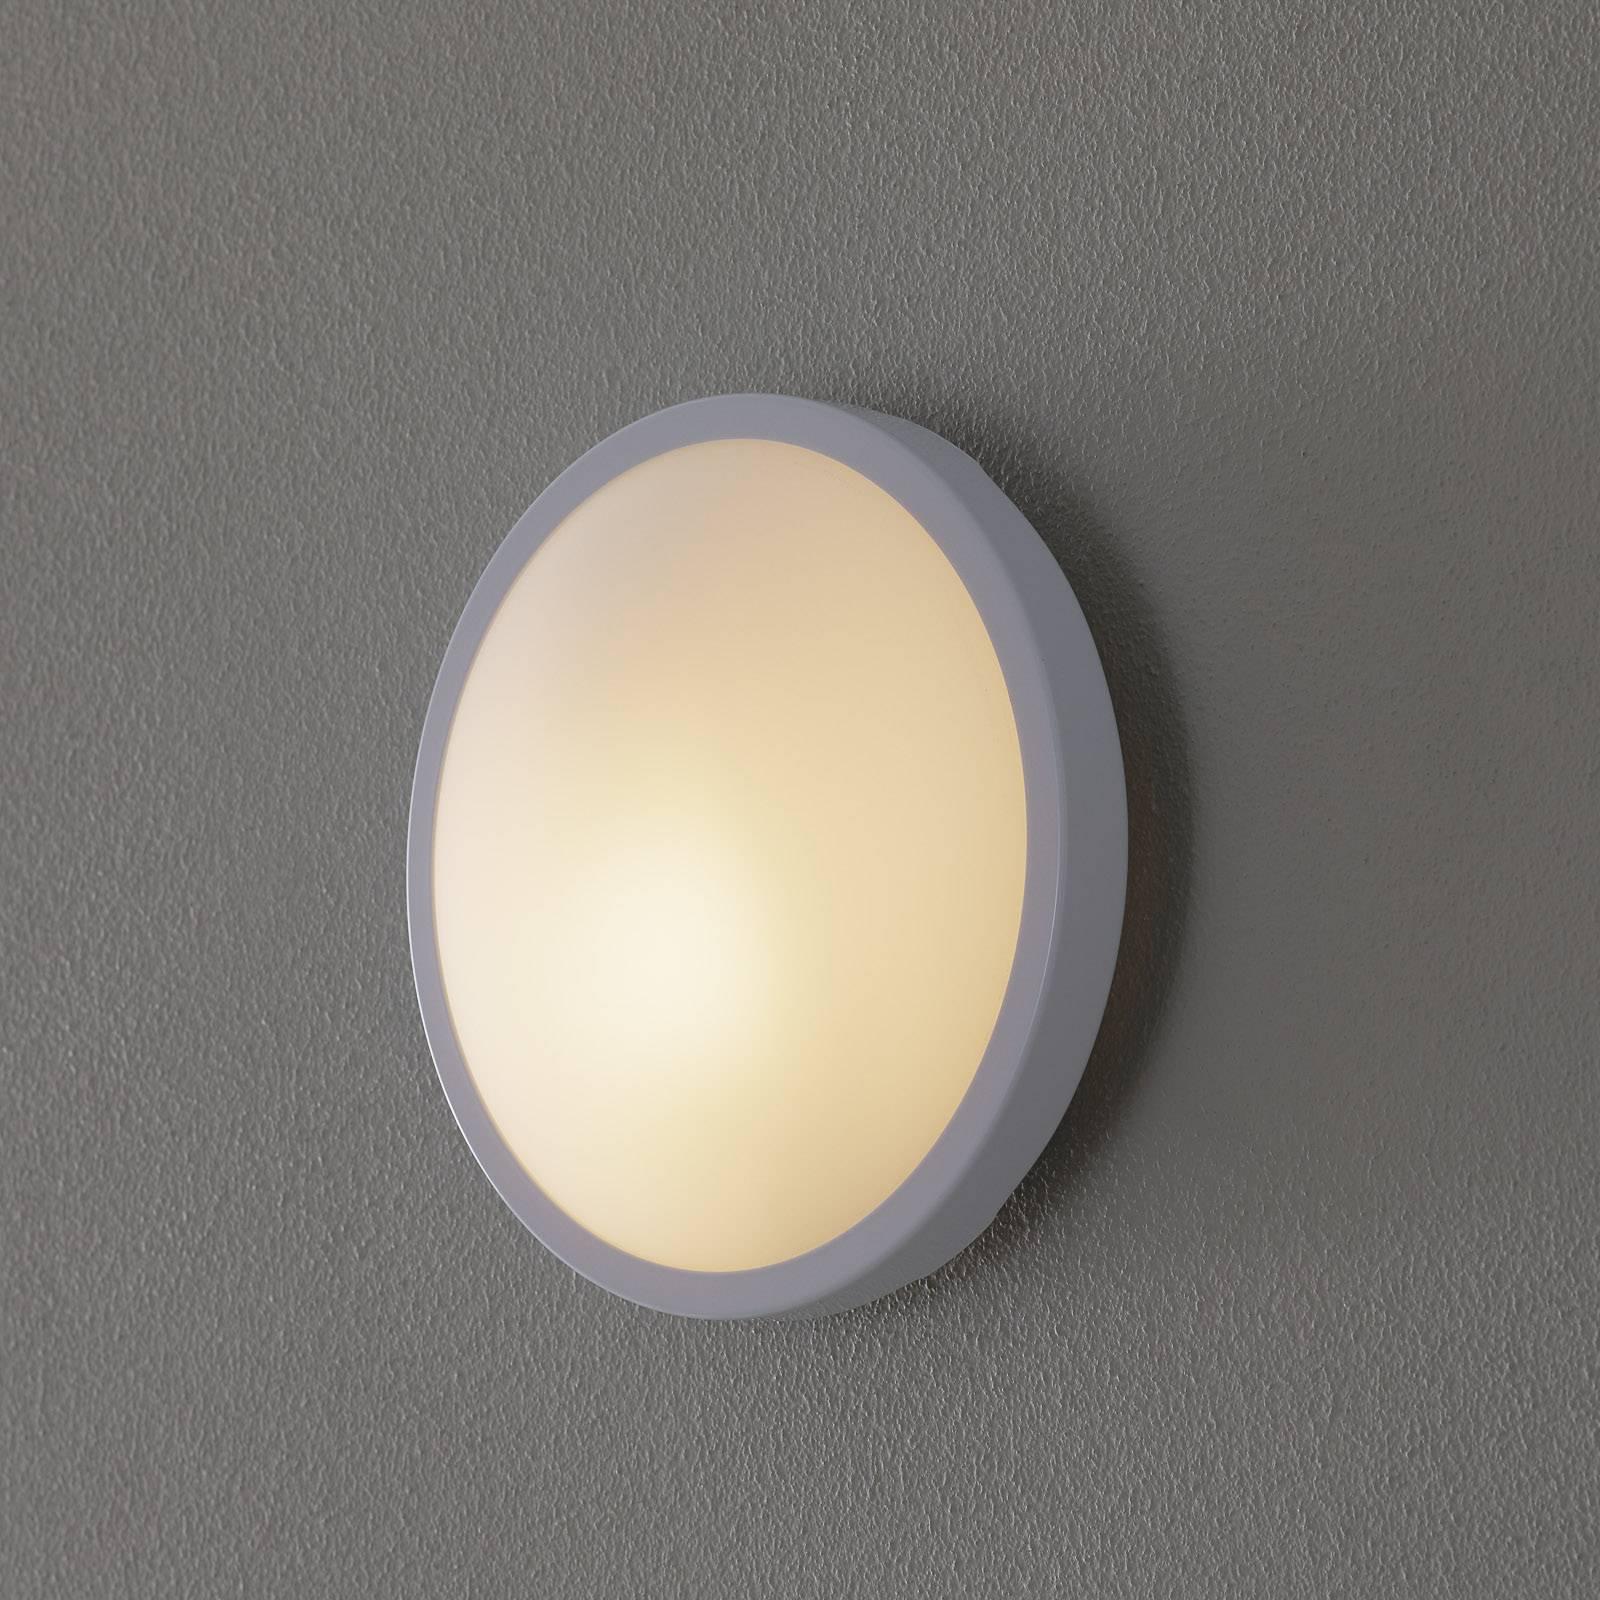 PLAZA plafond- en wandlamp 21,5 cm wit